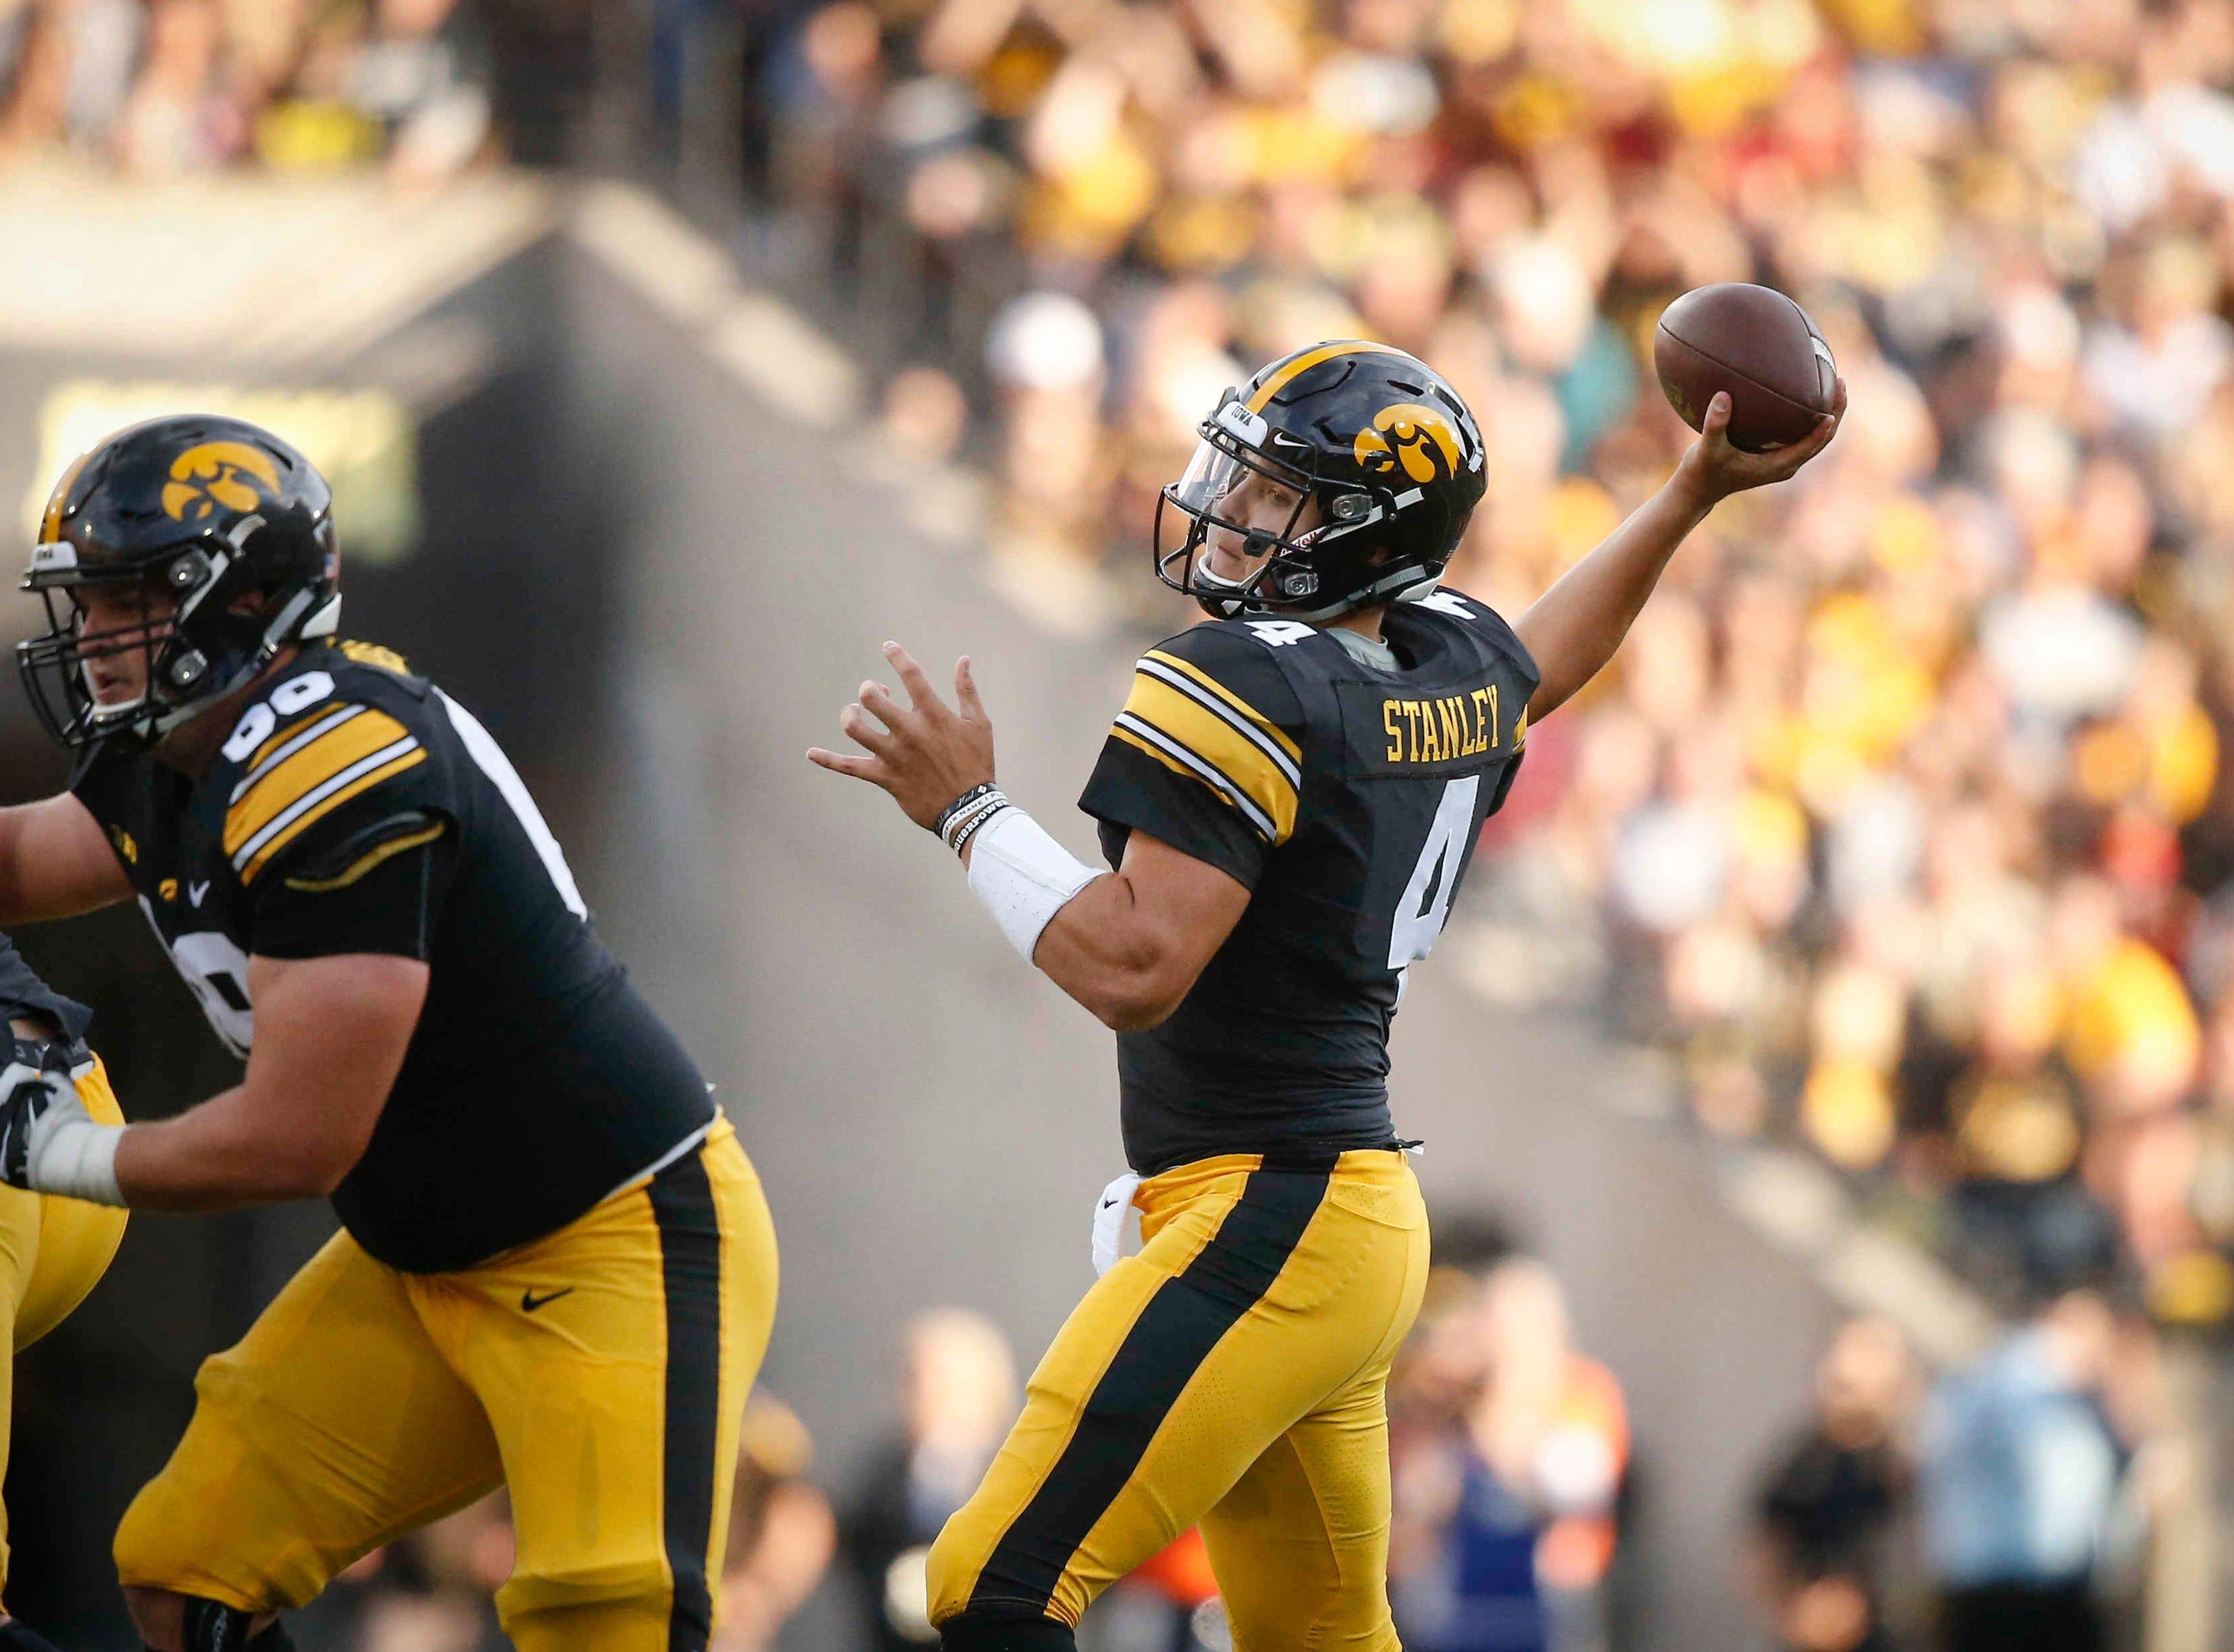 Iowa quarterback Nate Stanley fires a throw against Iowa State on Saturday, Sept. 8, 2018, at Kinnick Stadium in Iowa City.